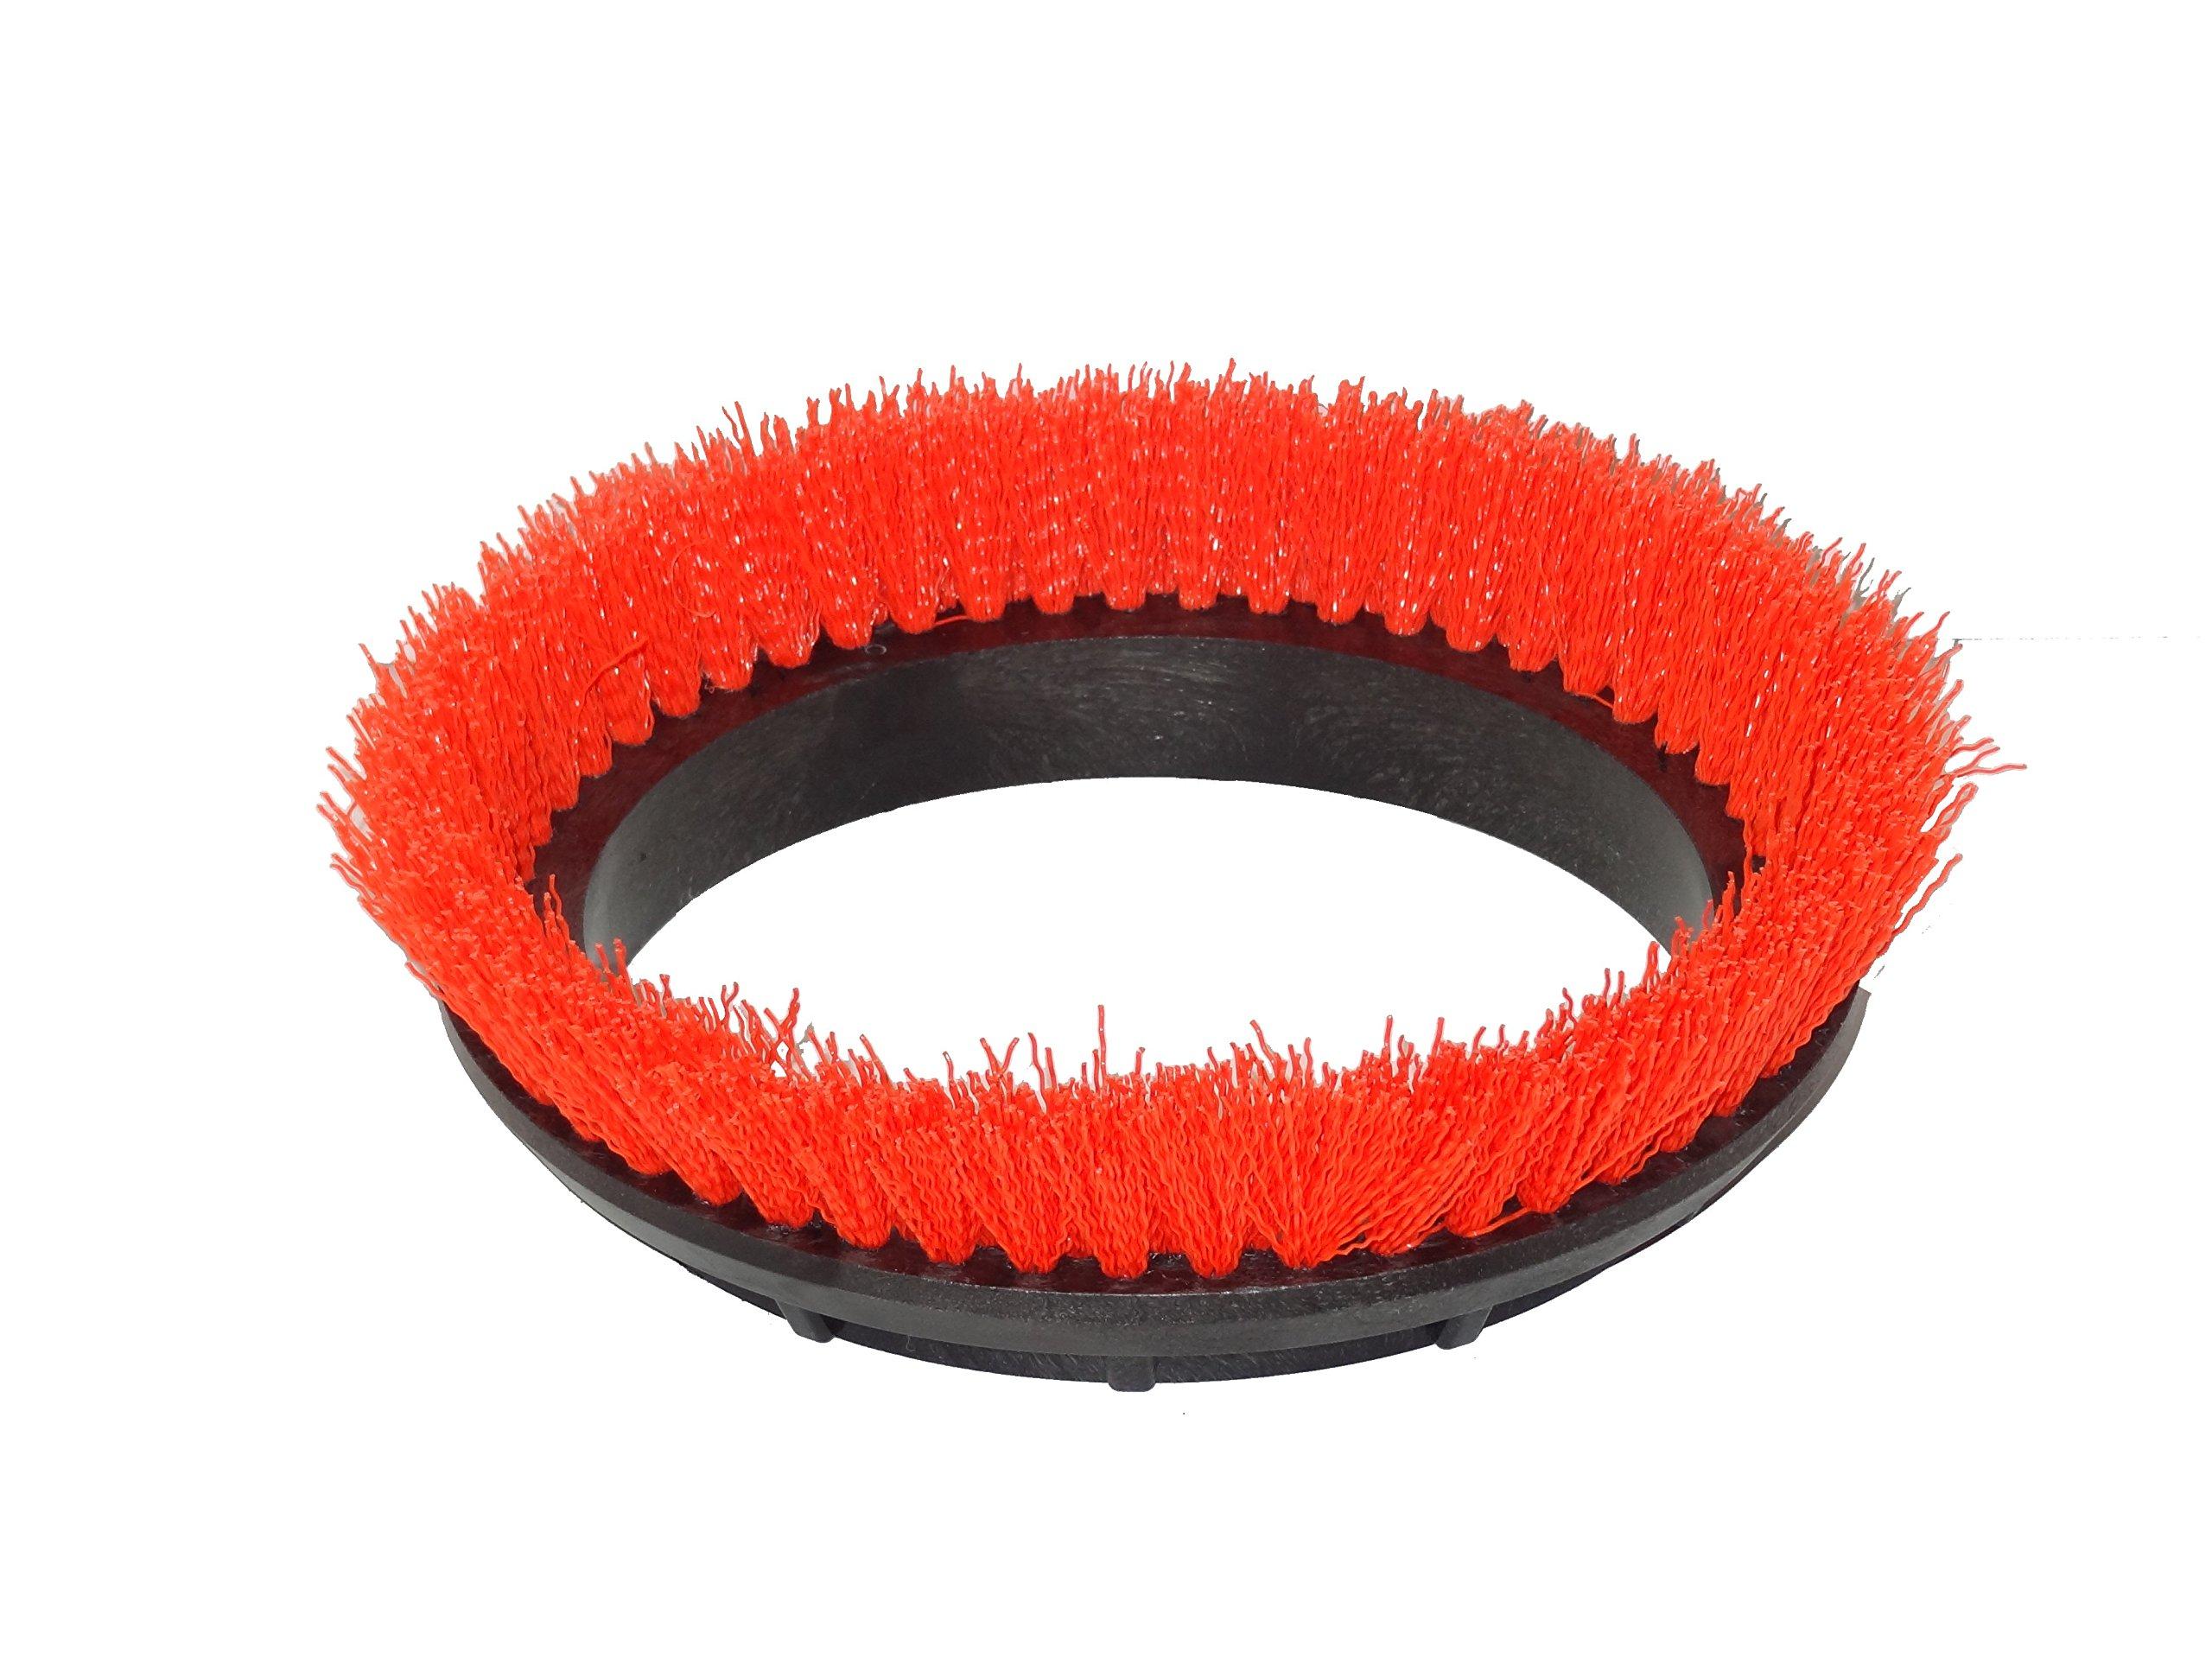 BISSELL BigGreen Commercial 237.047BG Scrub Brush, 0.028'' Bristle Diameter Crimped Polypropylene for BGEM9000 Easy Motion Floor Machine, 12'', Orange by Bissell